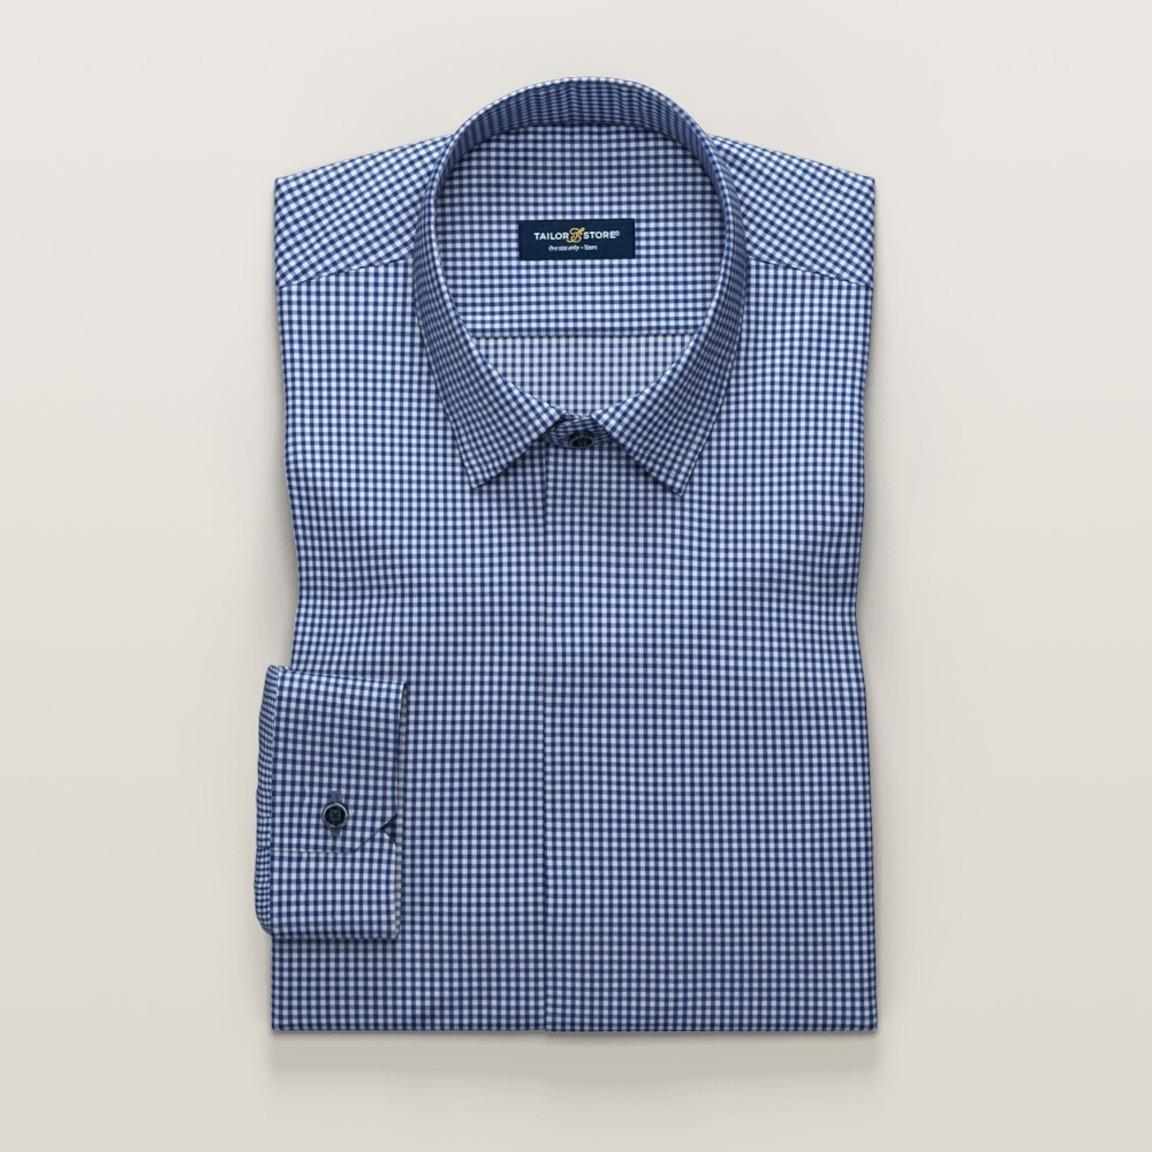 Checked dark blue ladies' dress shirt